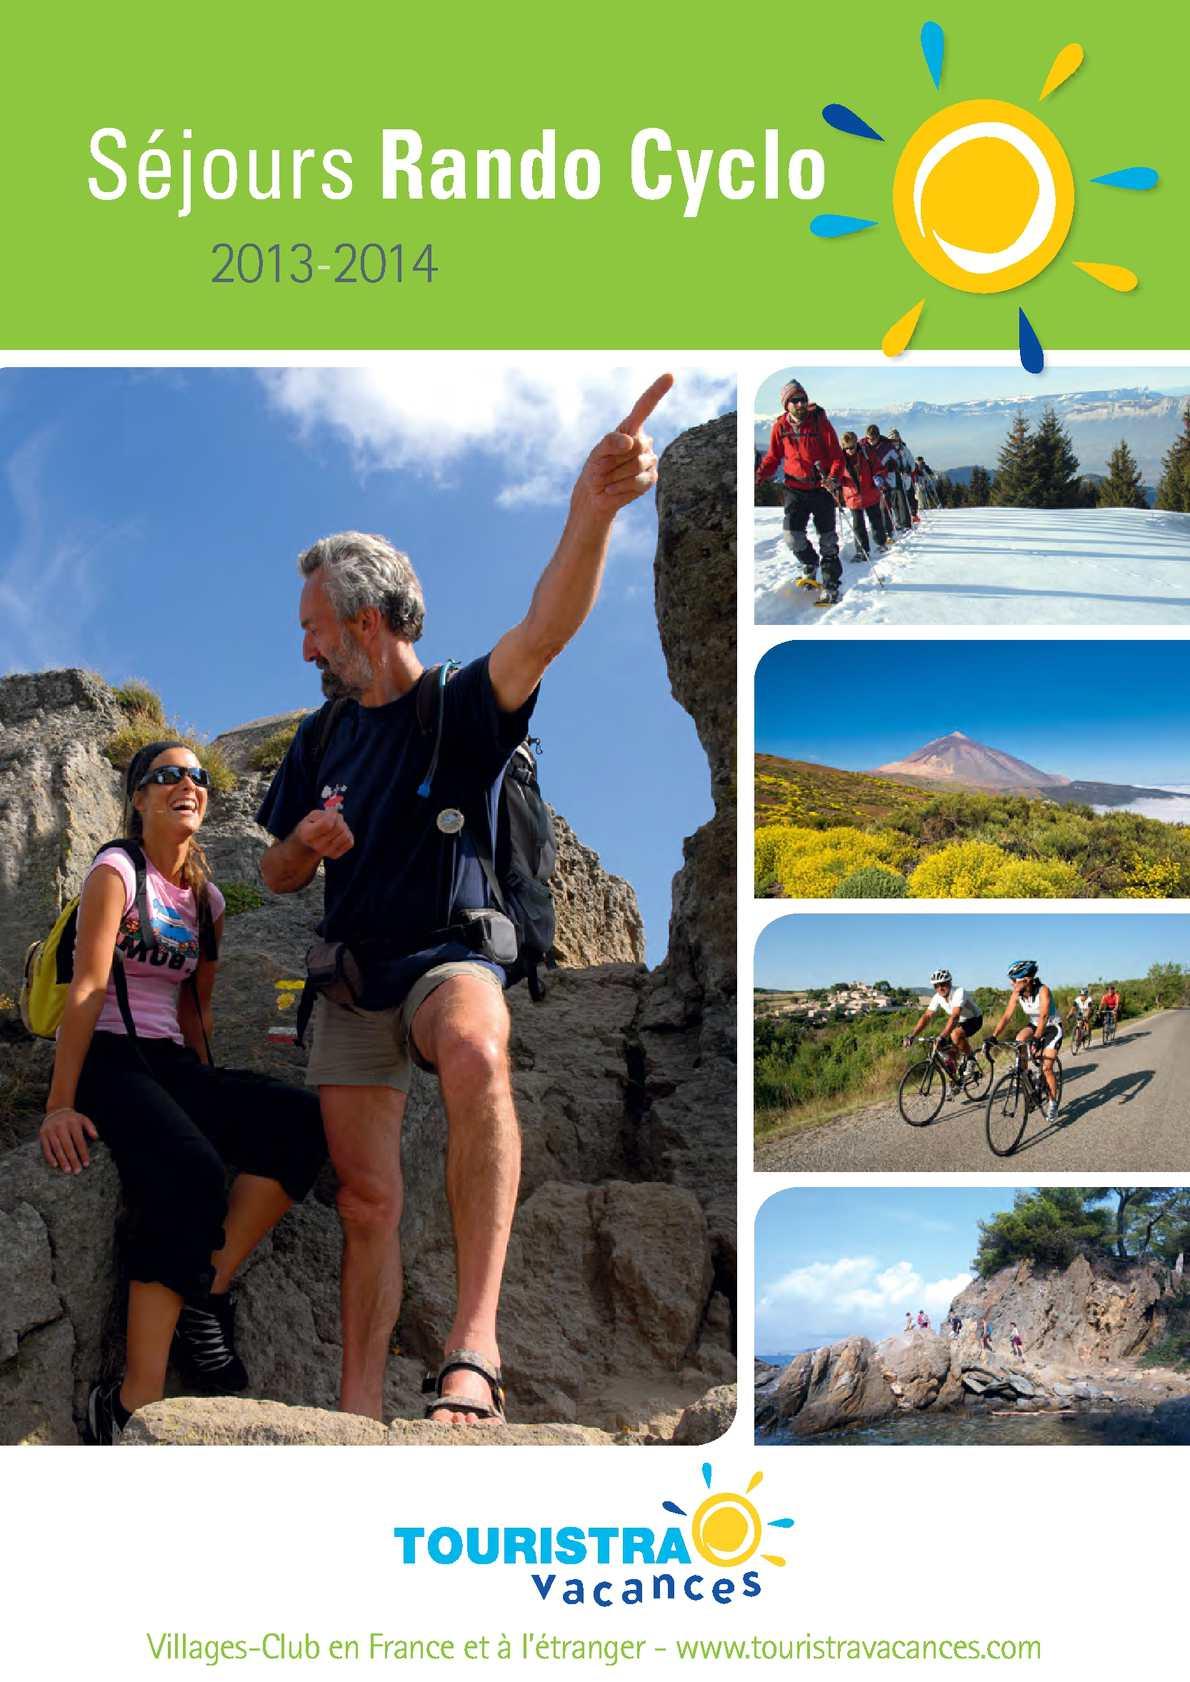 Calaméo Touristra Vacances Catalogue Séjours Randocyclo